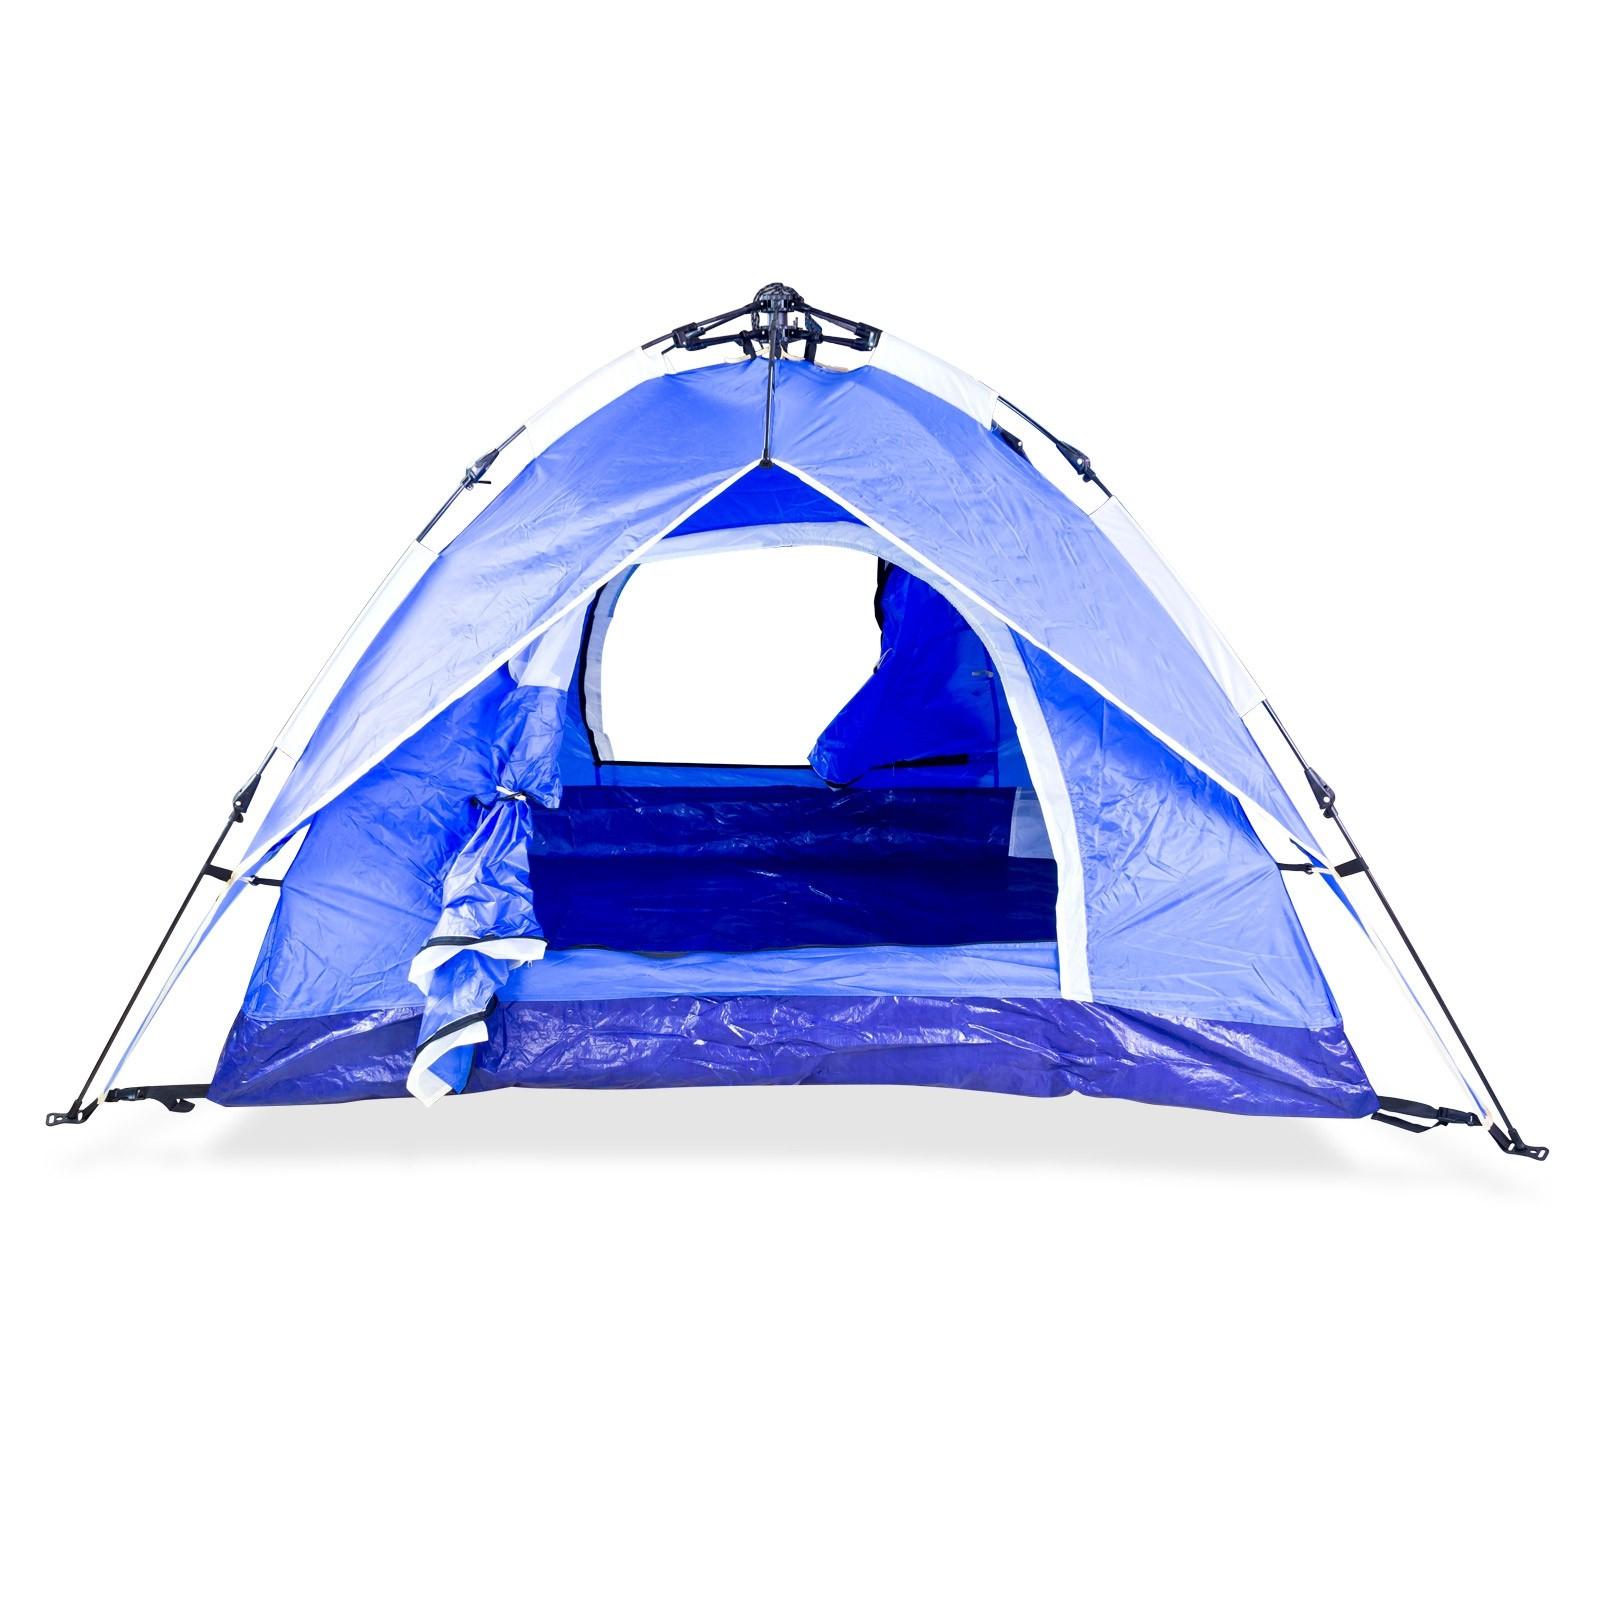 trekkingzelt campingzelt zelt igluzelt kuppelzelt f r 2. Black Bedroom Furniture Sets. Home Design Ideas